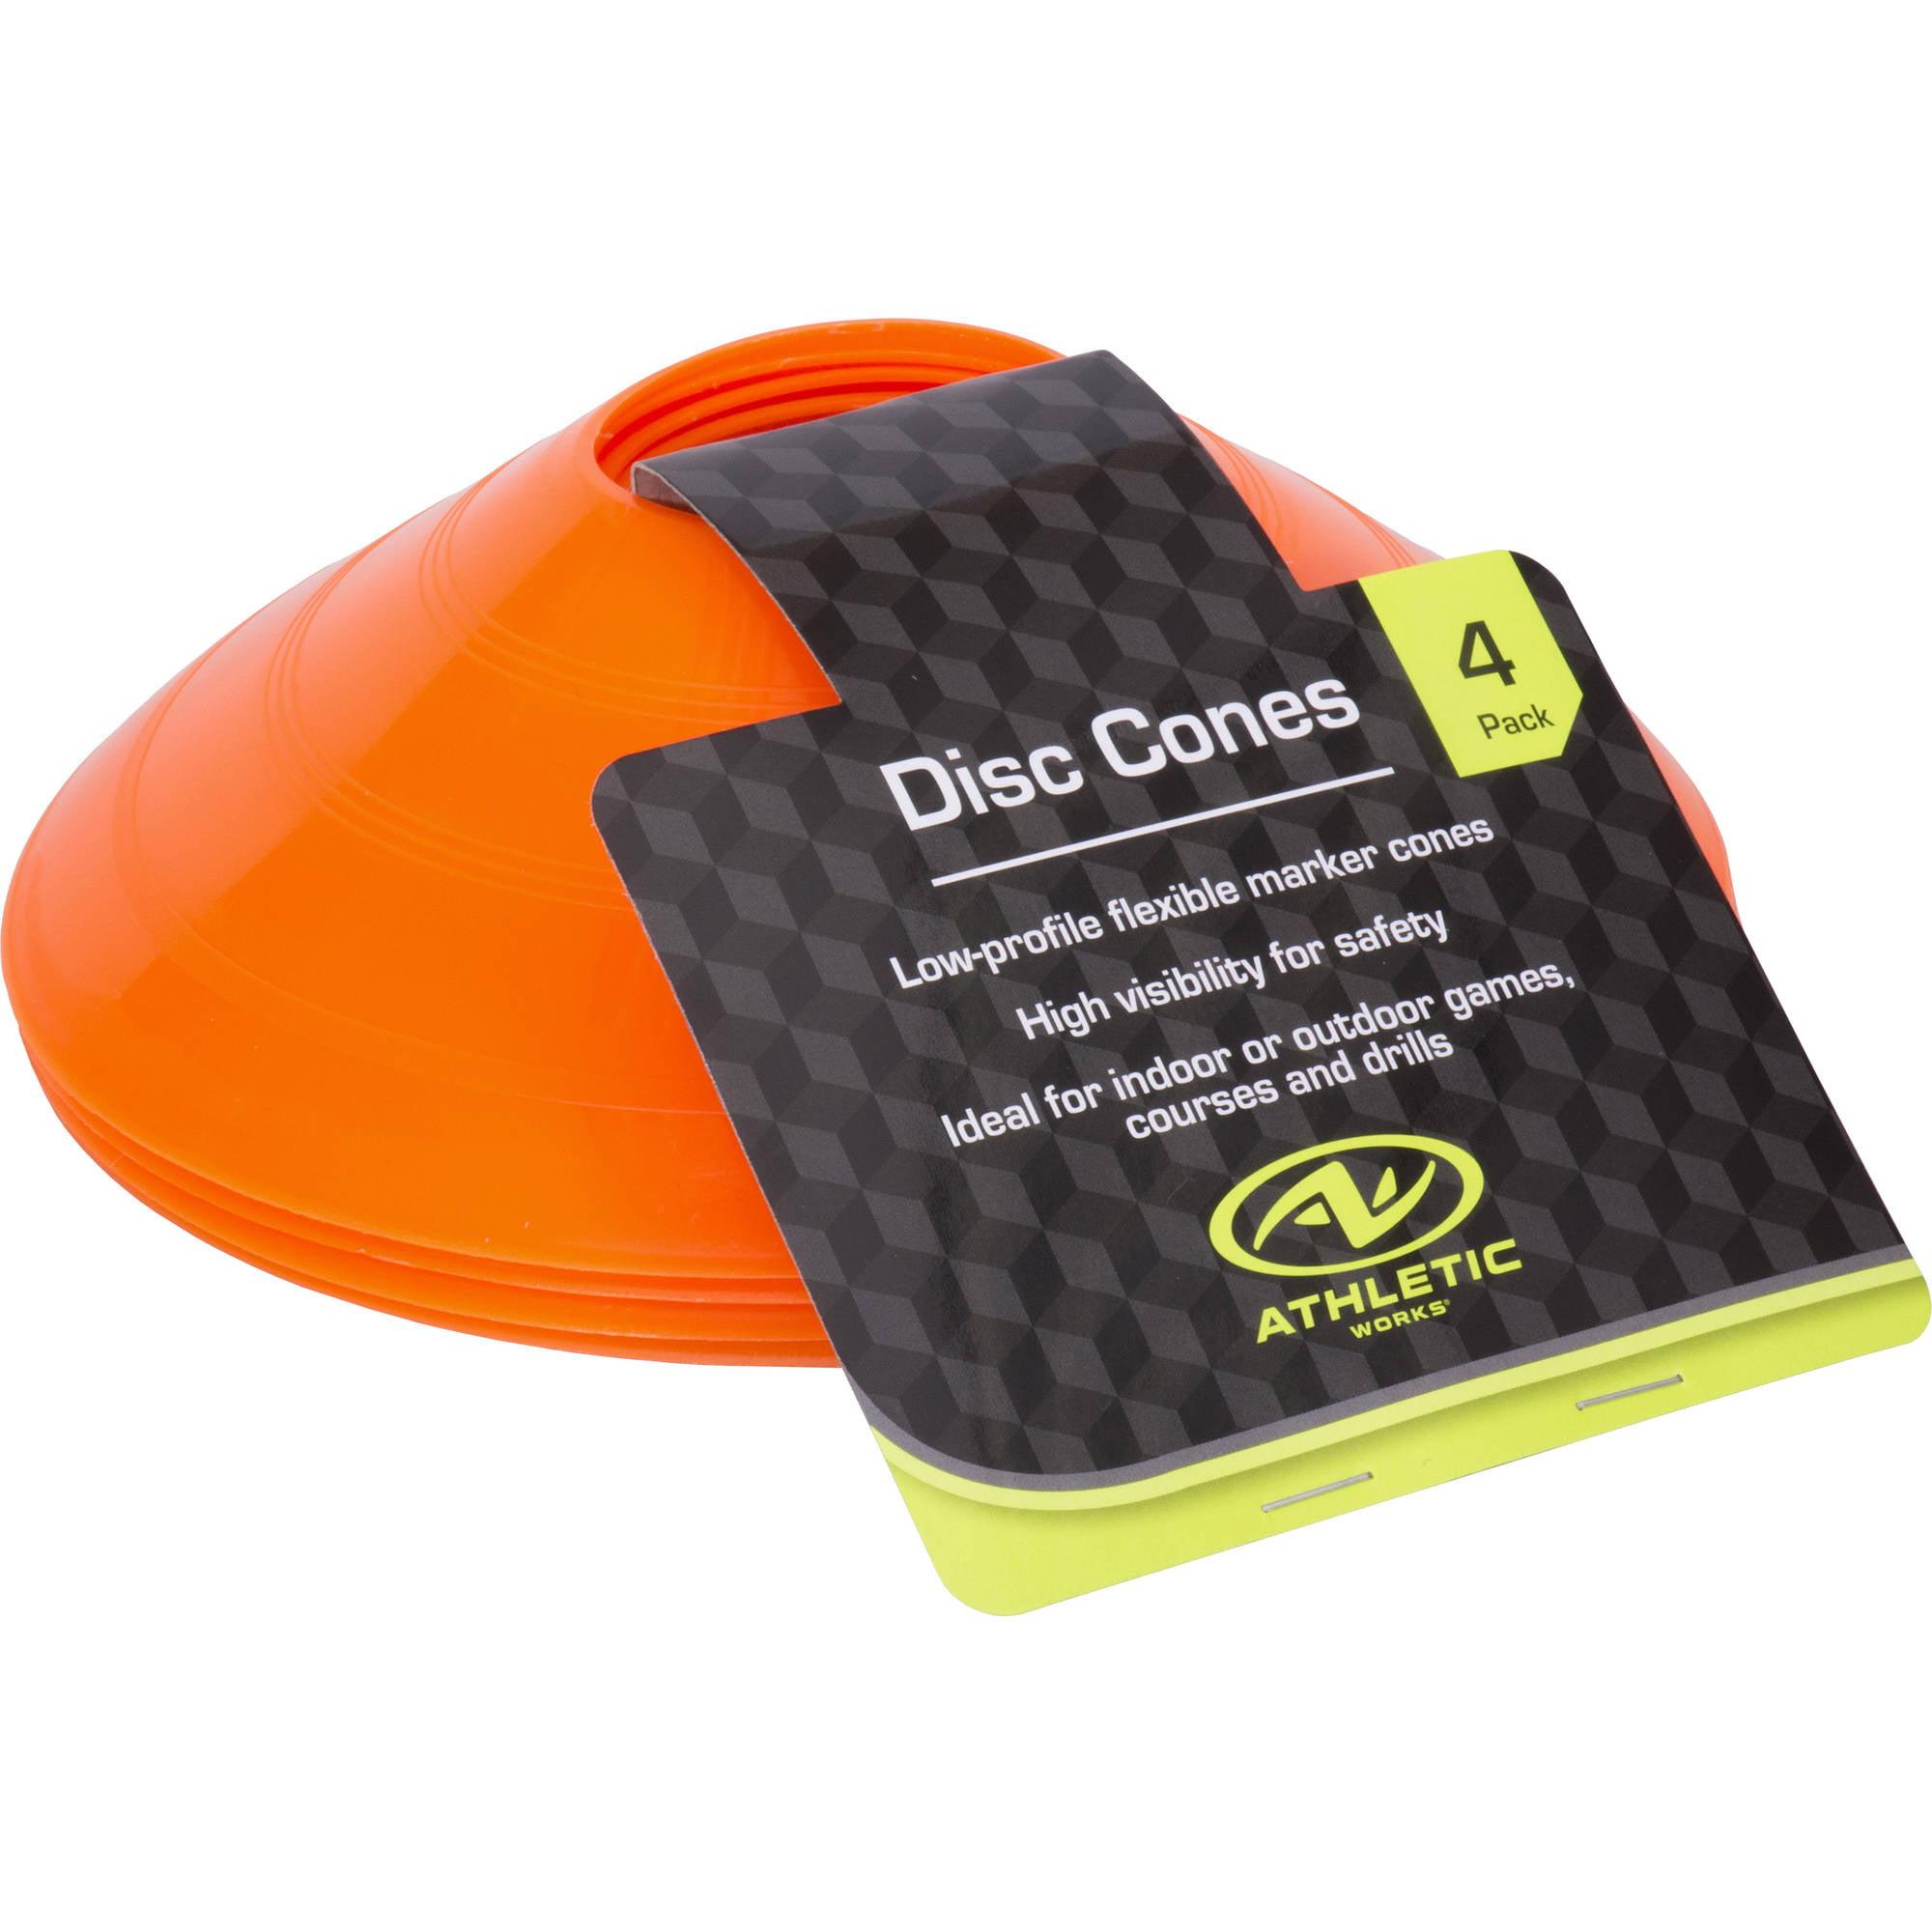 Athletic Works Disc Cones